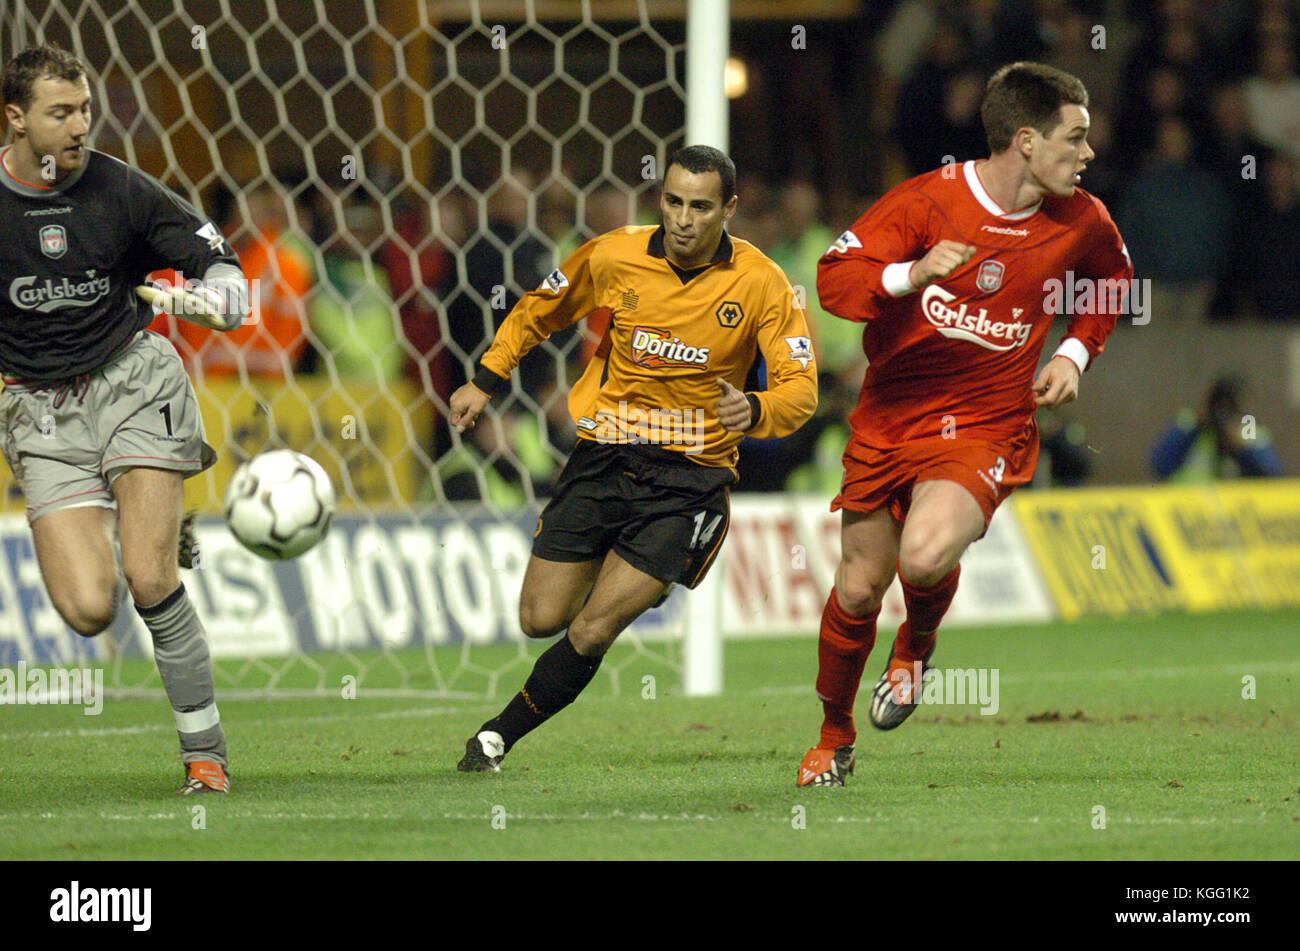 Footballer Jorge Silas Wolverhampton Wanderers v Liverpool 21 January 2004 - Stock Image